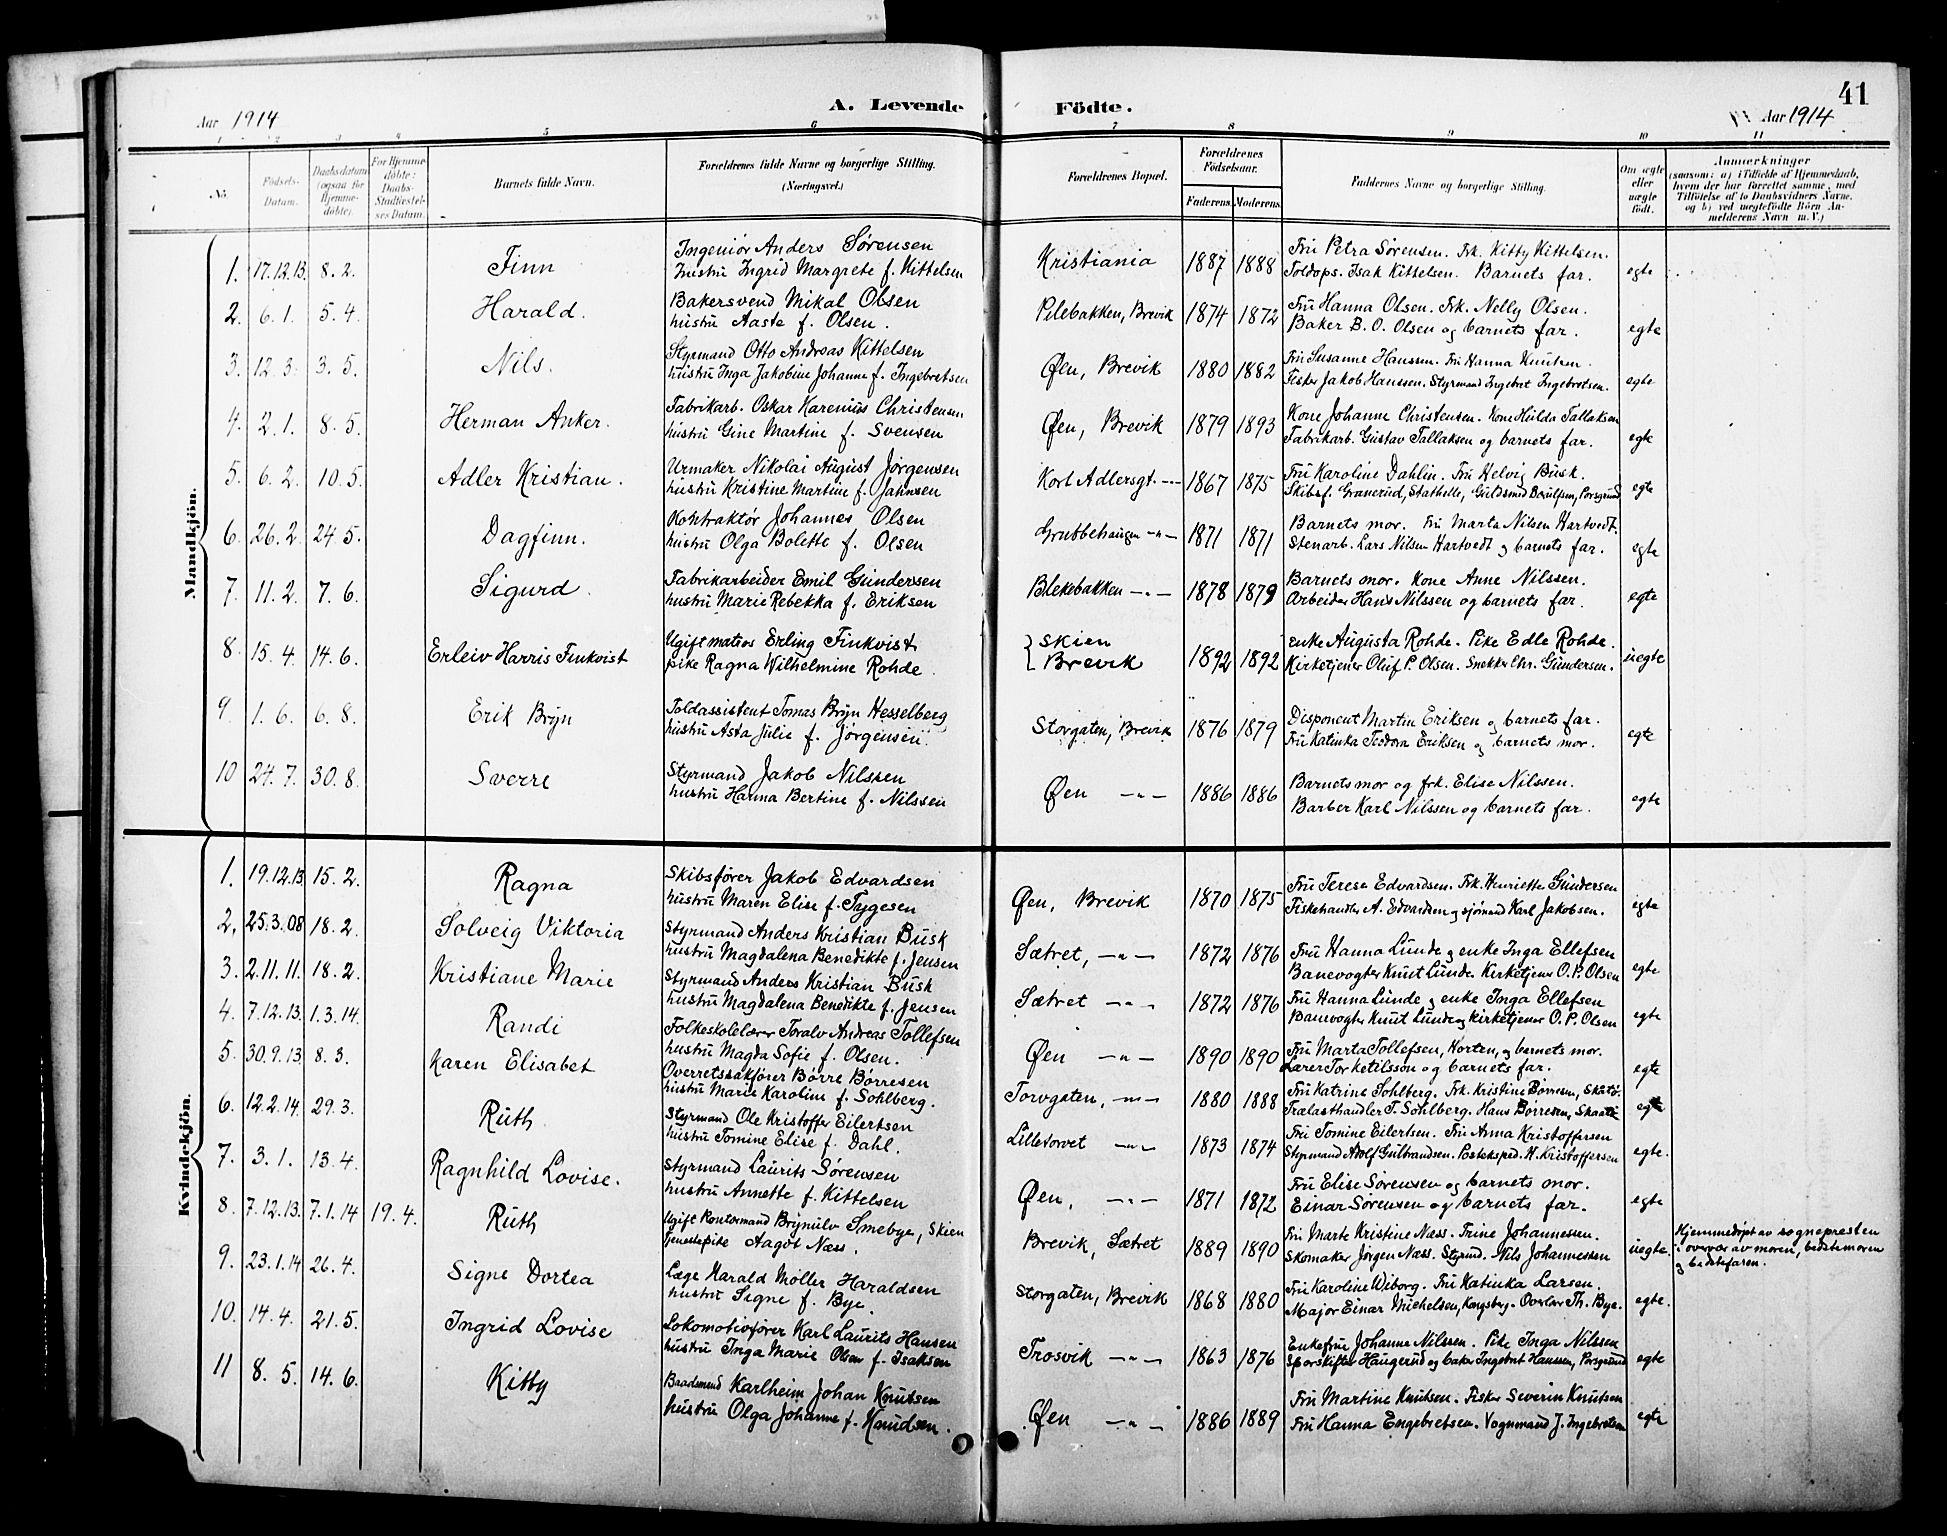 SAKO, Brevik kirkebøker, G/Ga/L0005: Klokkerbok nr. 5, 1901-1924, s. 41